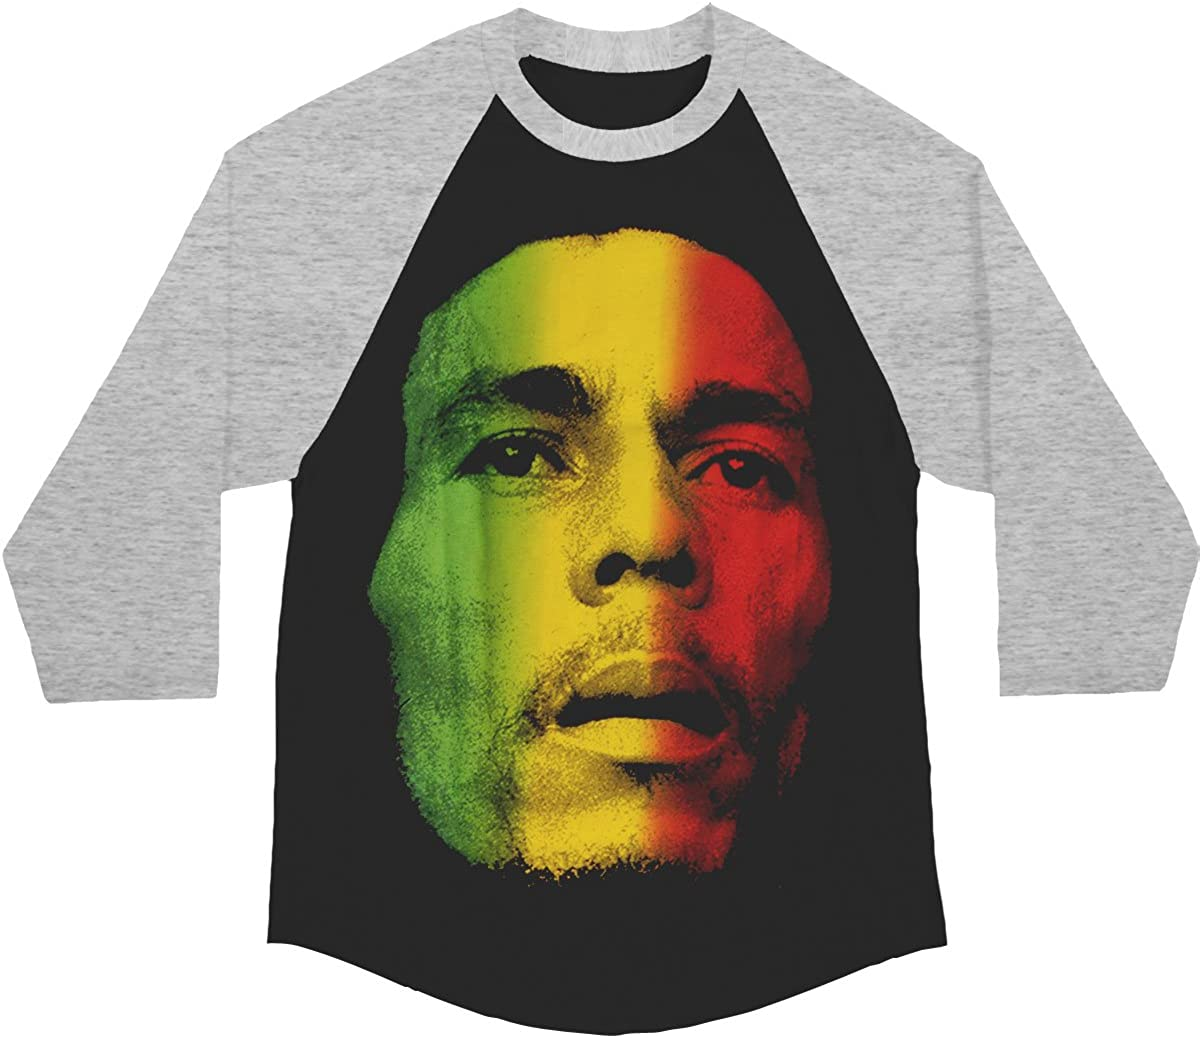 Bob Marley Men's Black Jersey Baseball Challenge the lowest price Brand Cheap Sale Venue